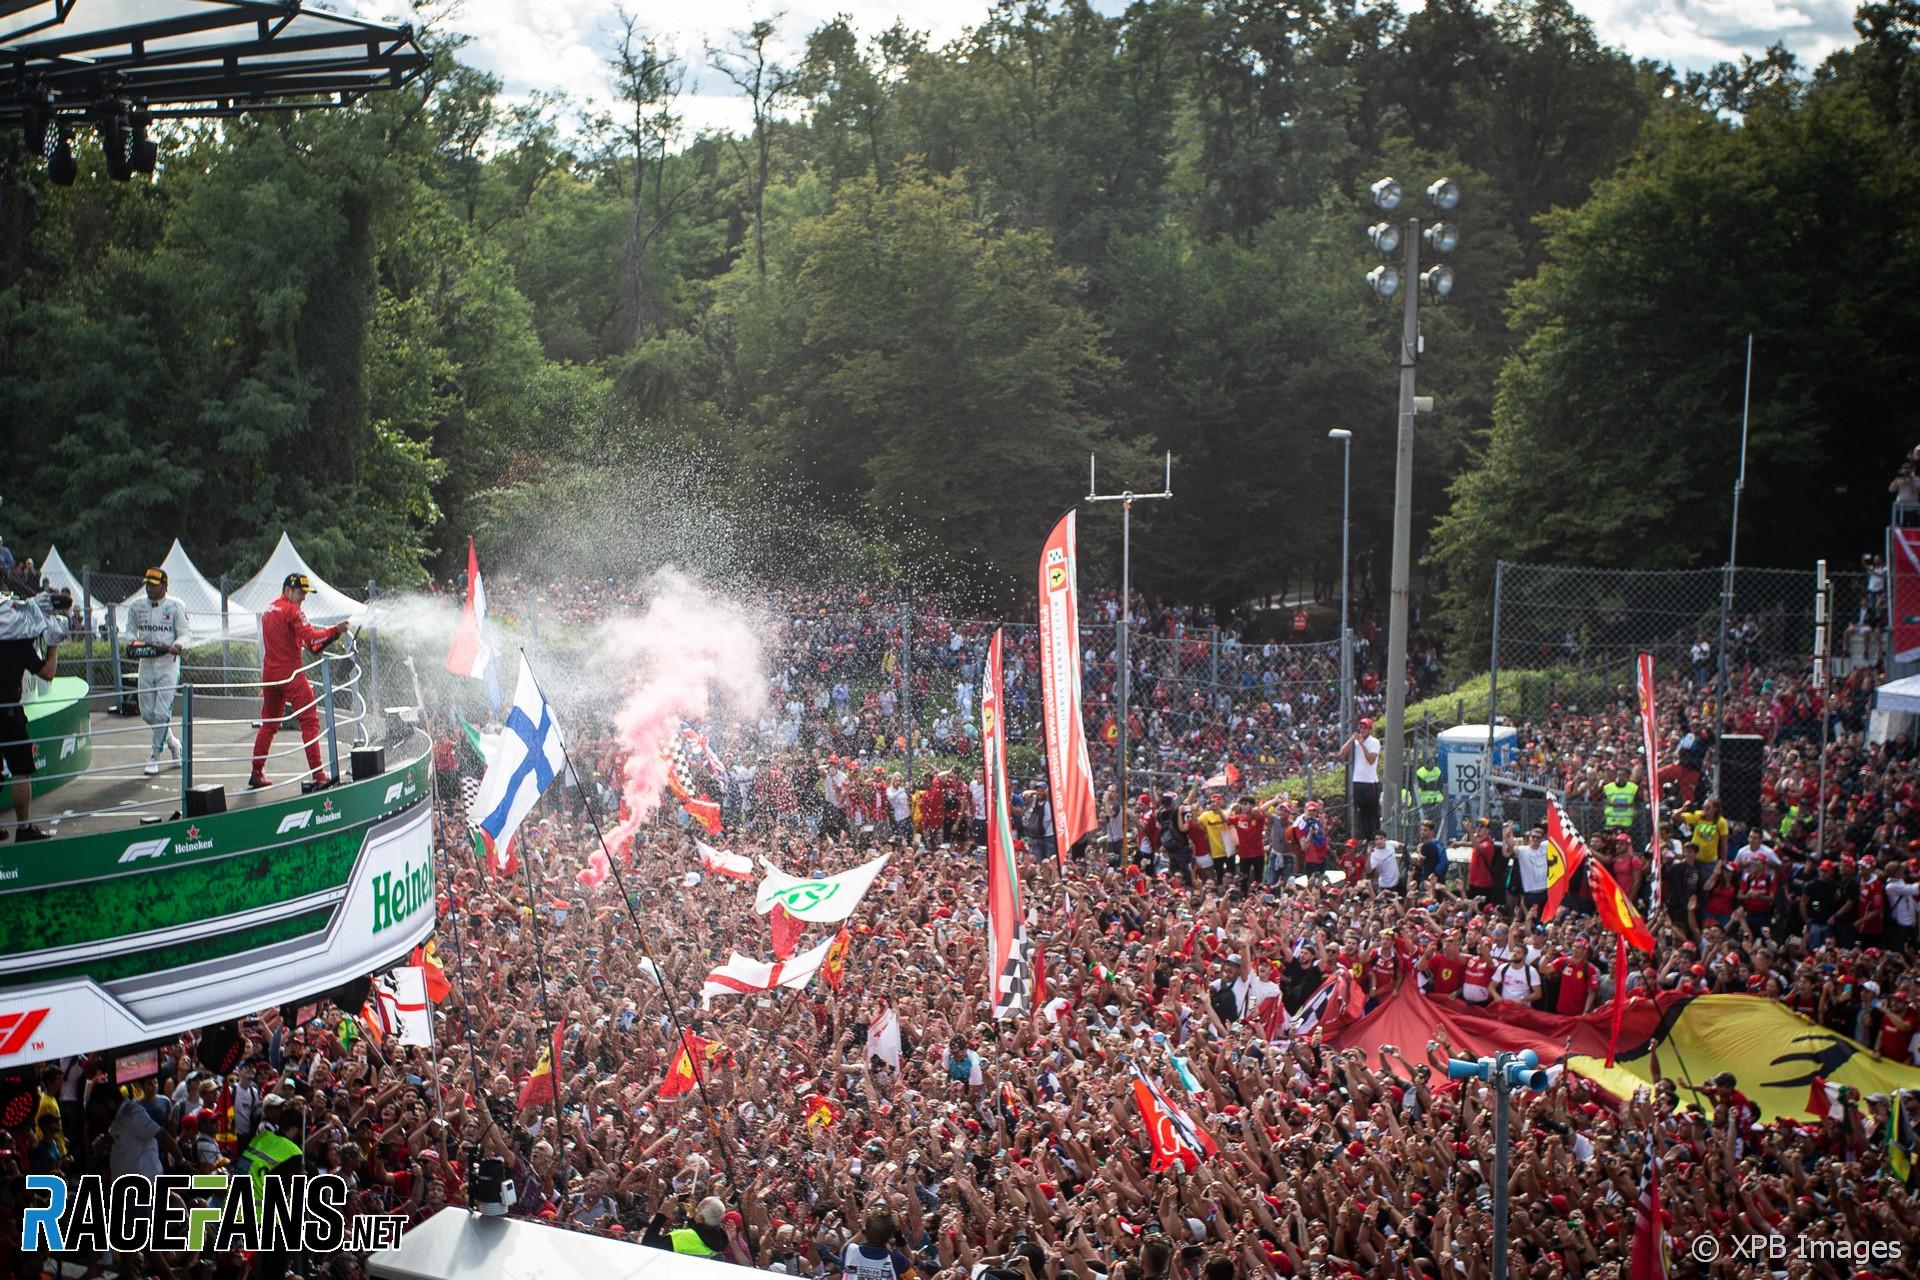 Charles Leclerc, Ferrari, Monza, 2019 · RaceFans